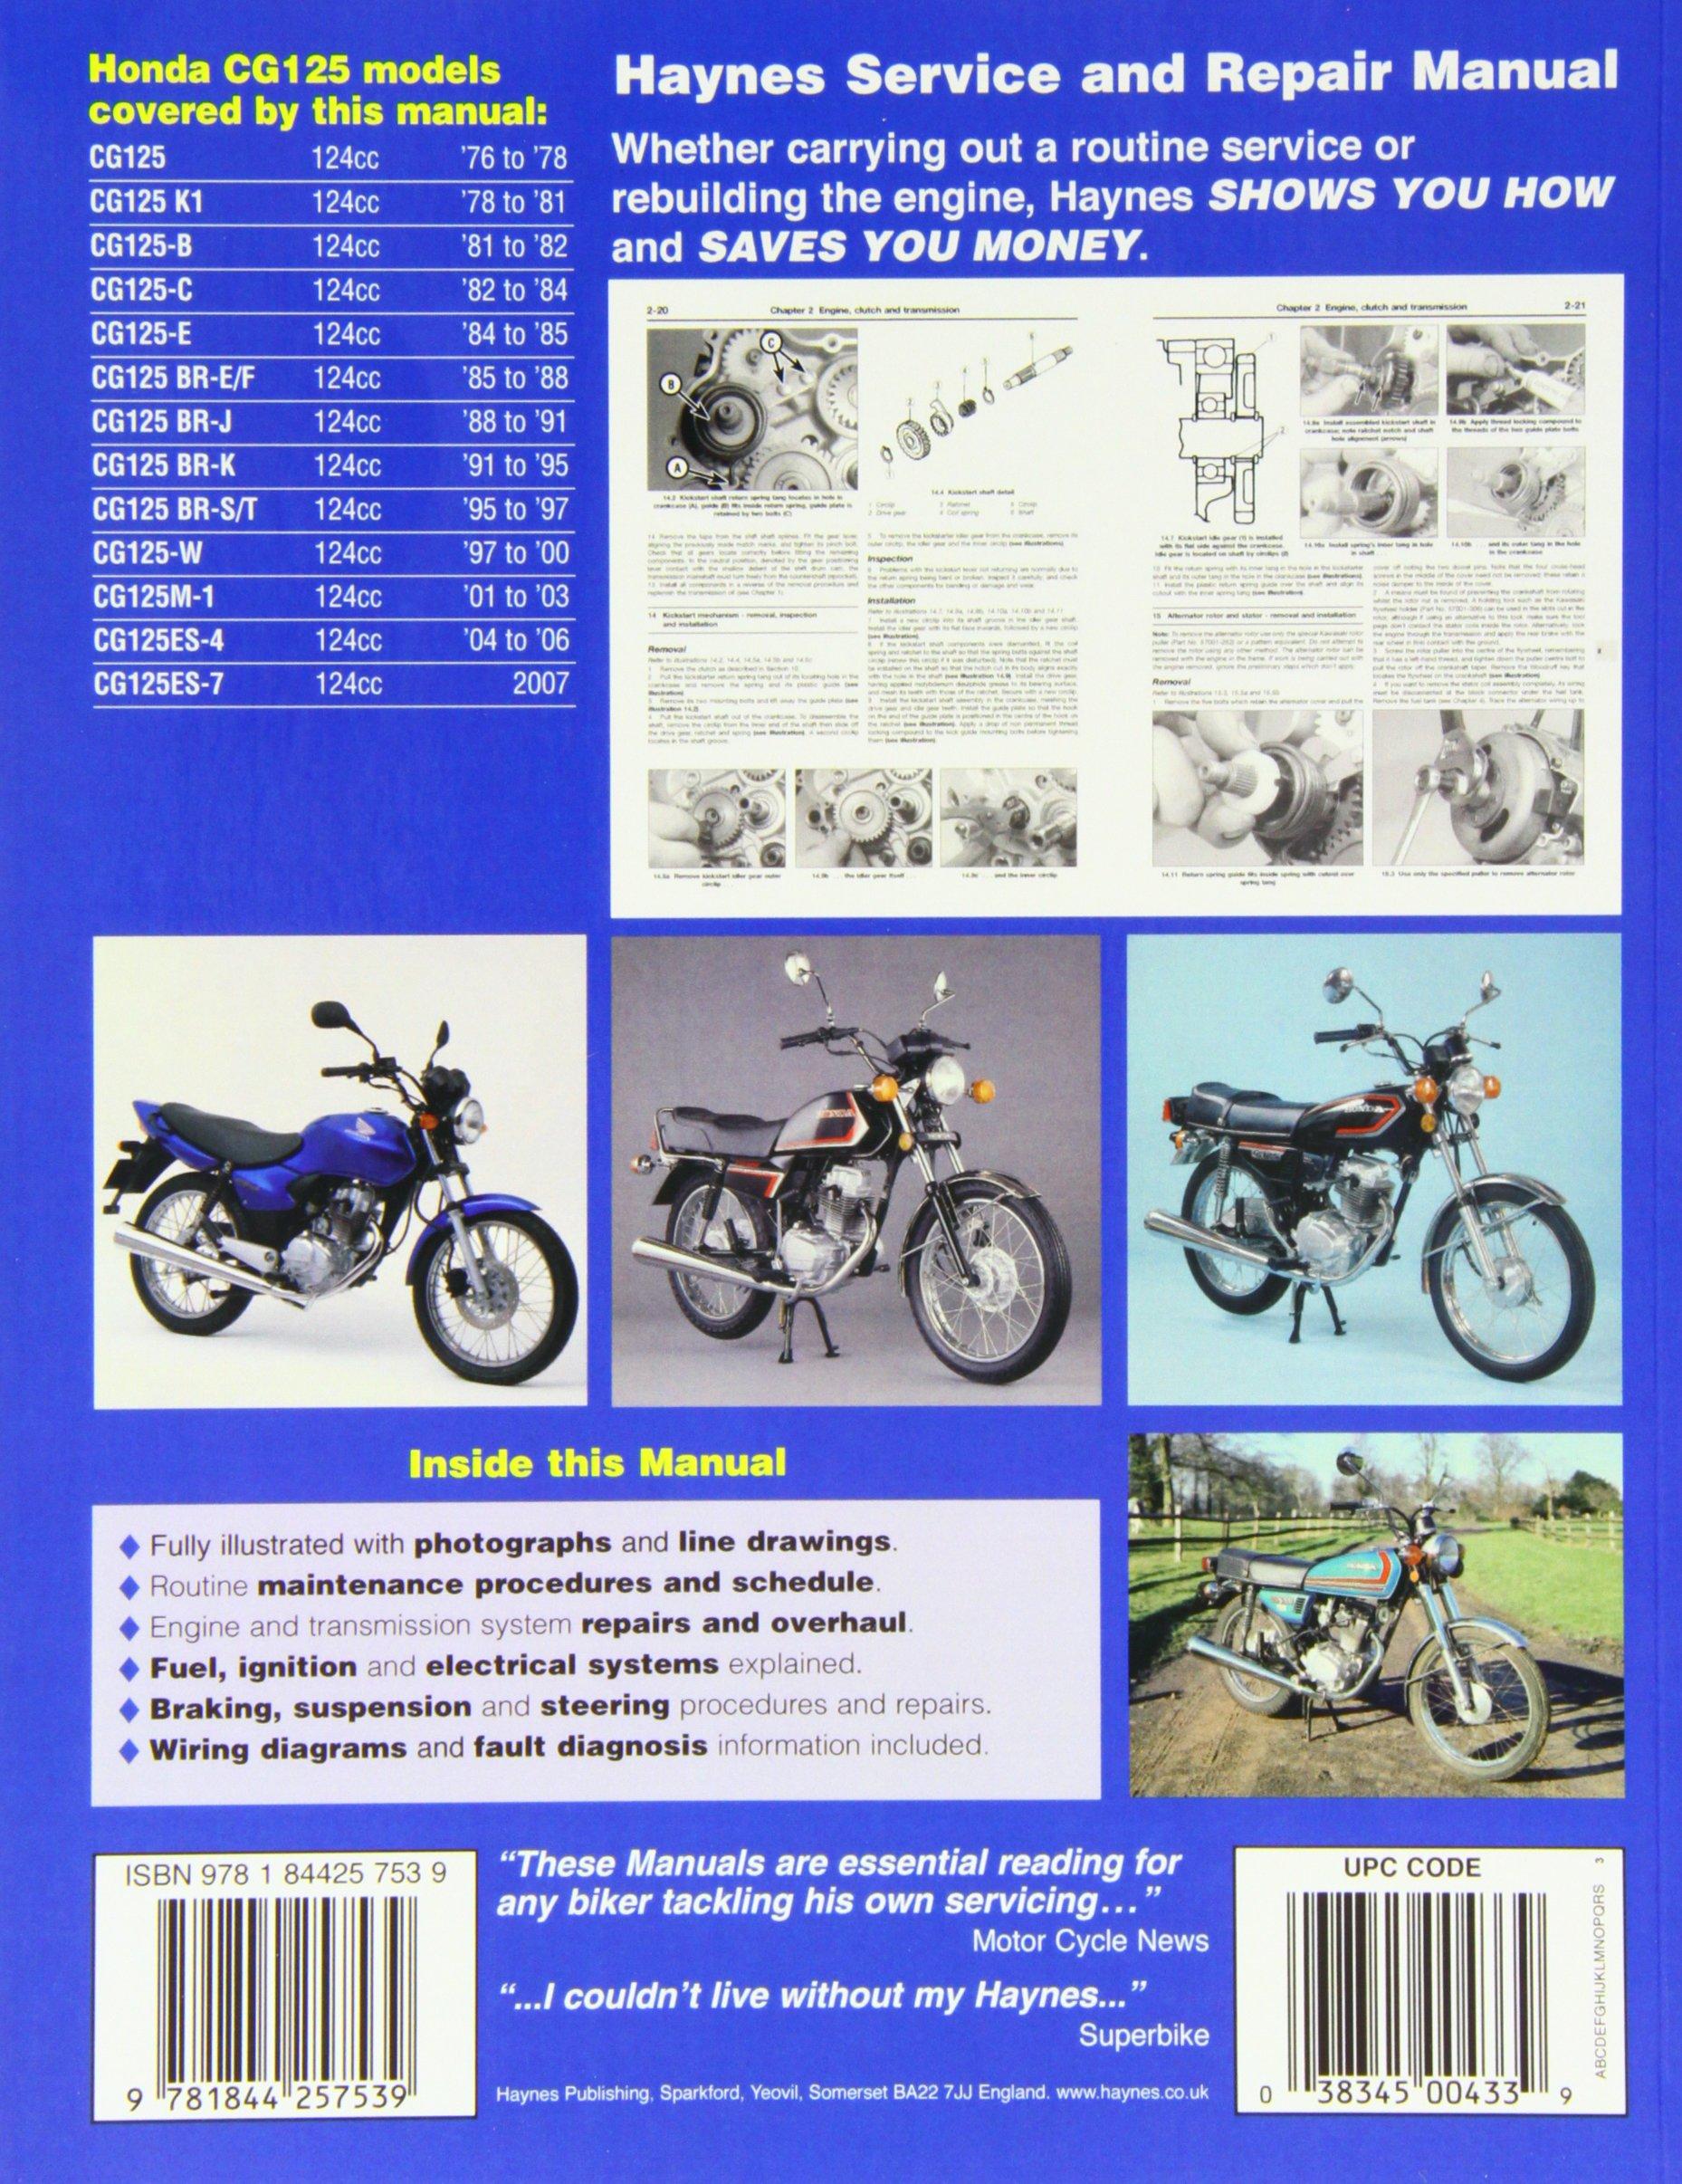 Honda Cg125 1976 2007 To Haynes Service And Repair Reading Wiring Diagram Manuals Anon 9781844257539 Books